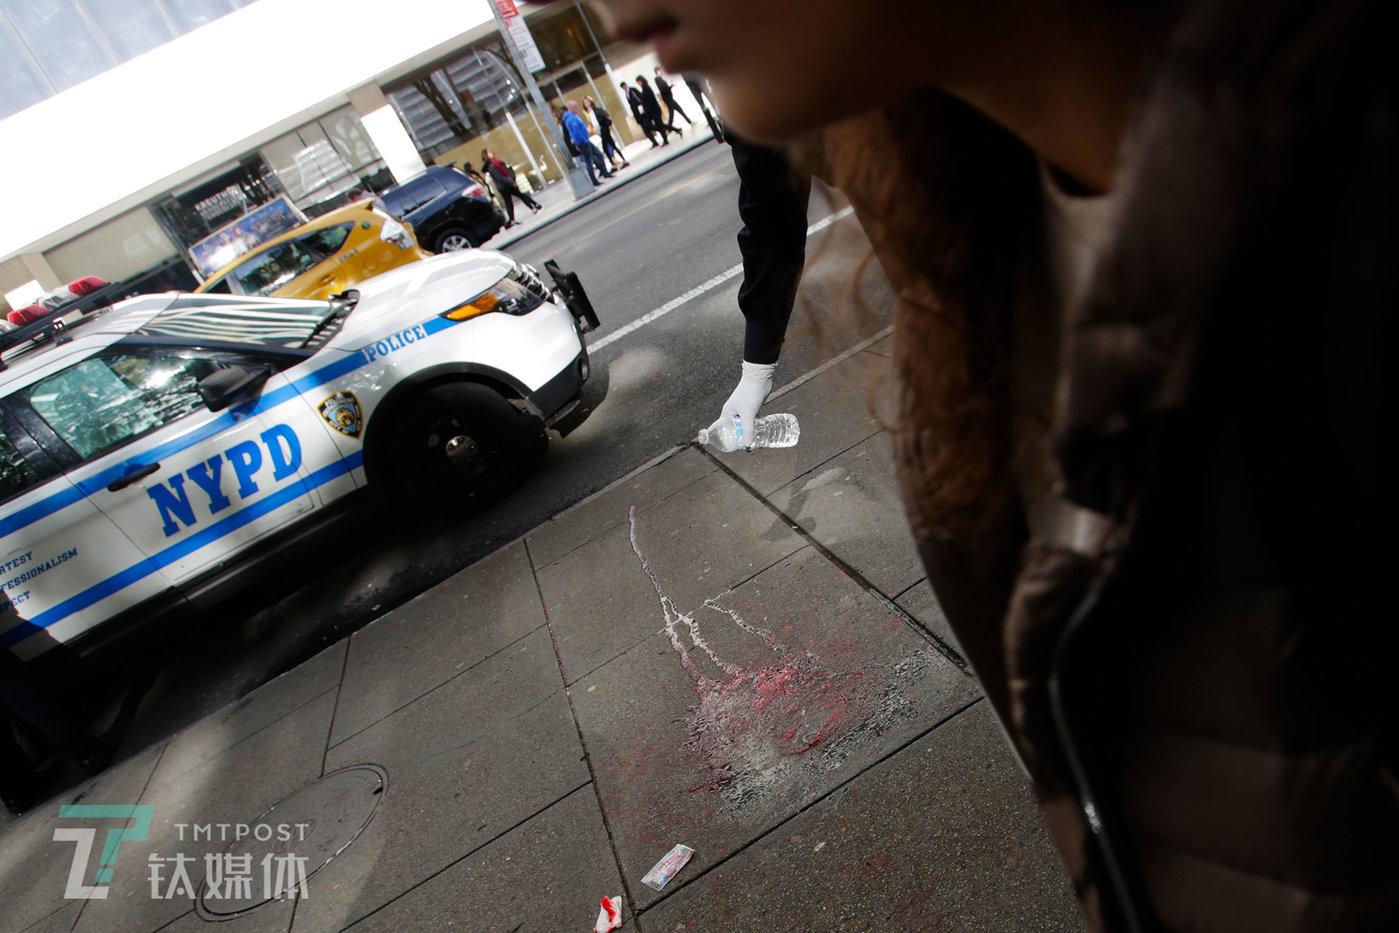 【NYPD】10月20日,美国纽约曼哈顿街头,一起持刀抢劫案现场,警察用矿泉水清洗伤者留在地面的血渍。